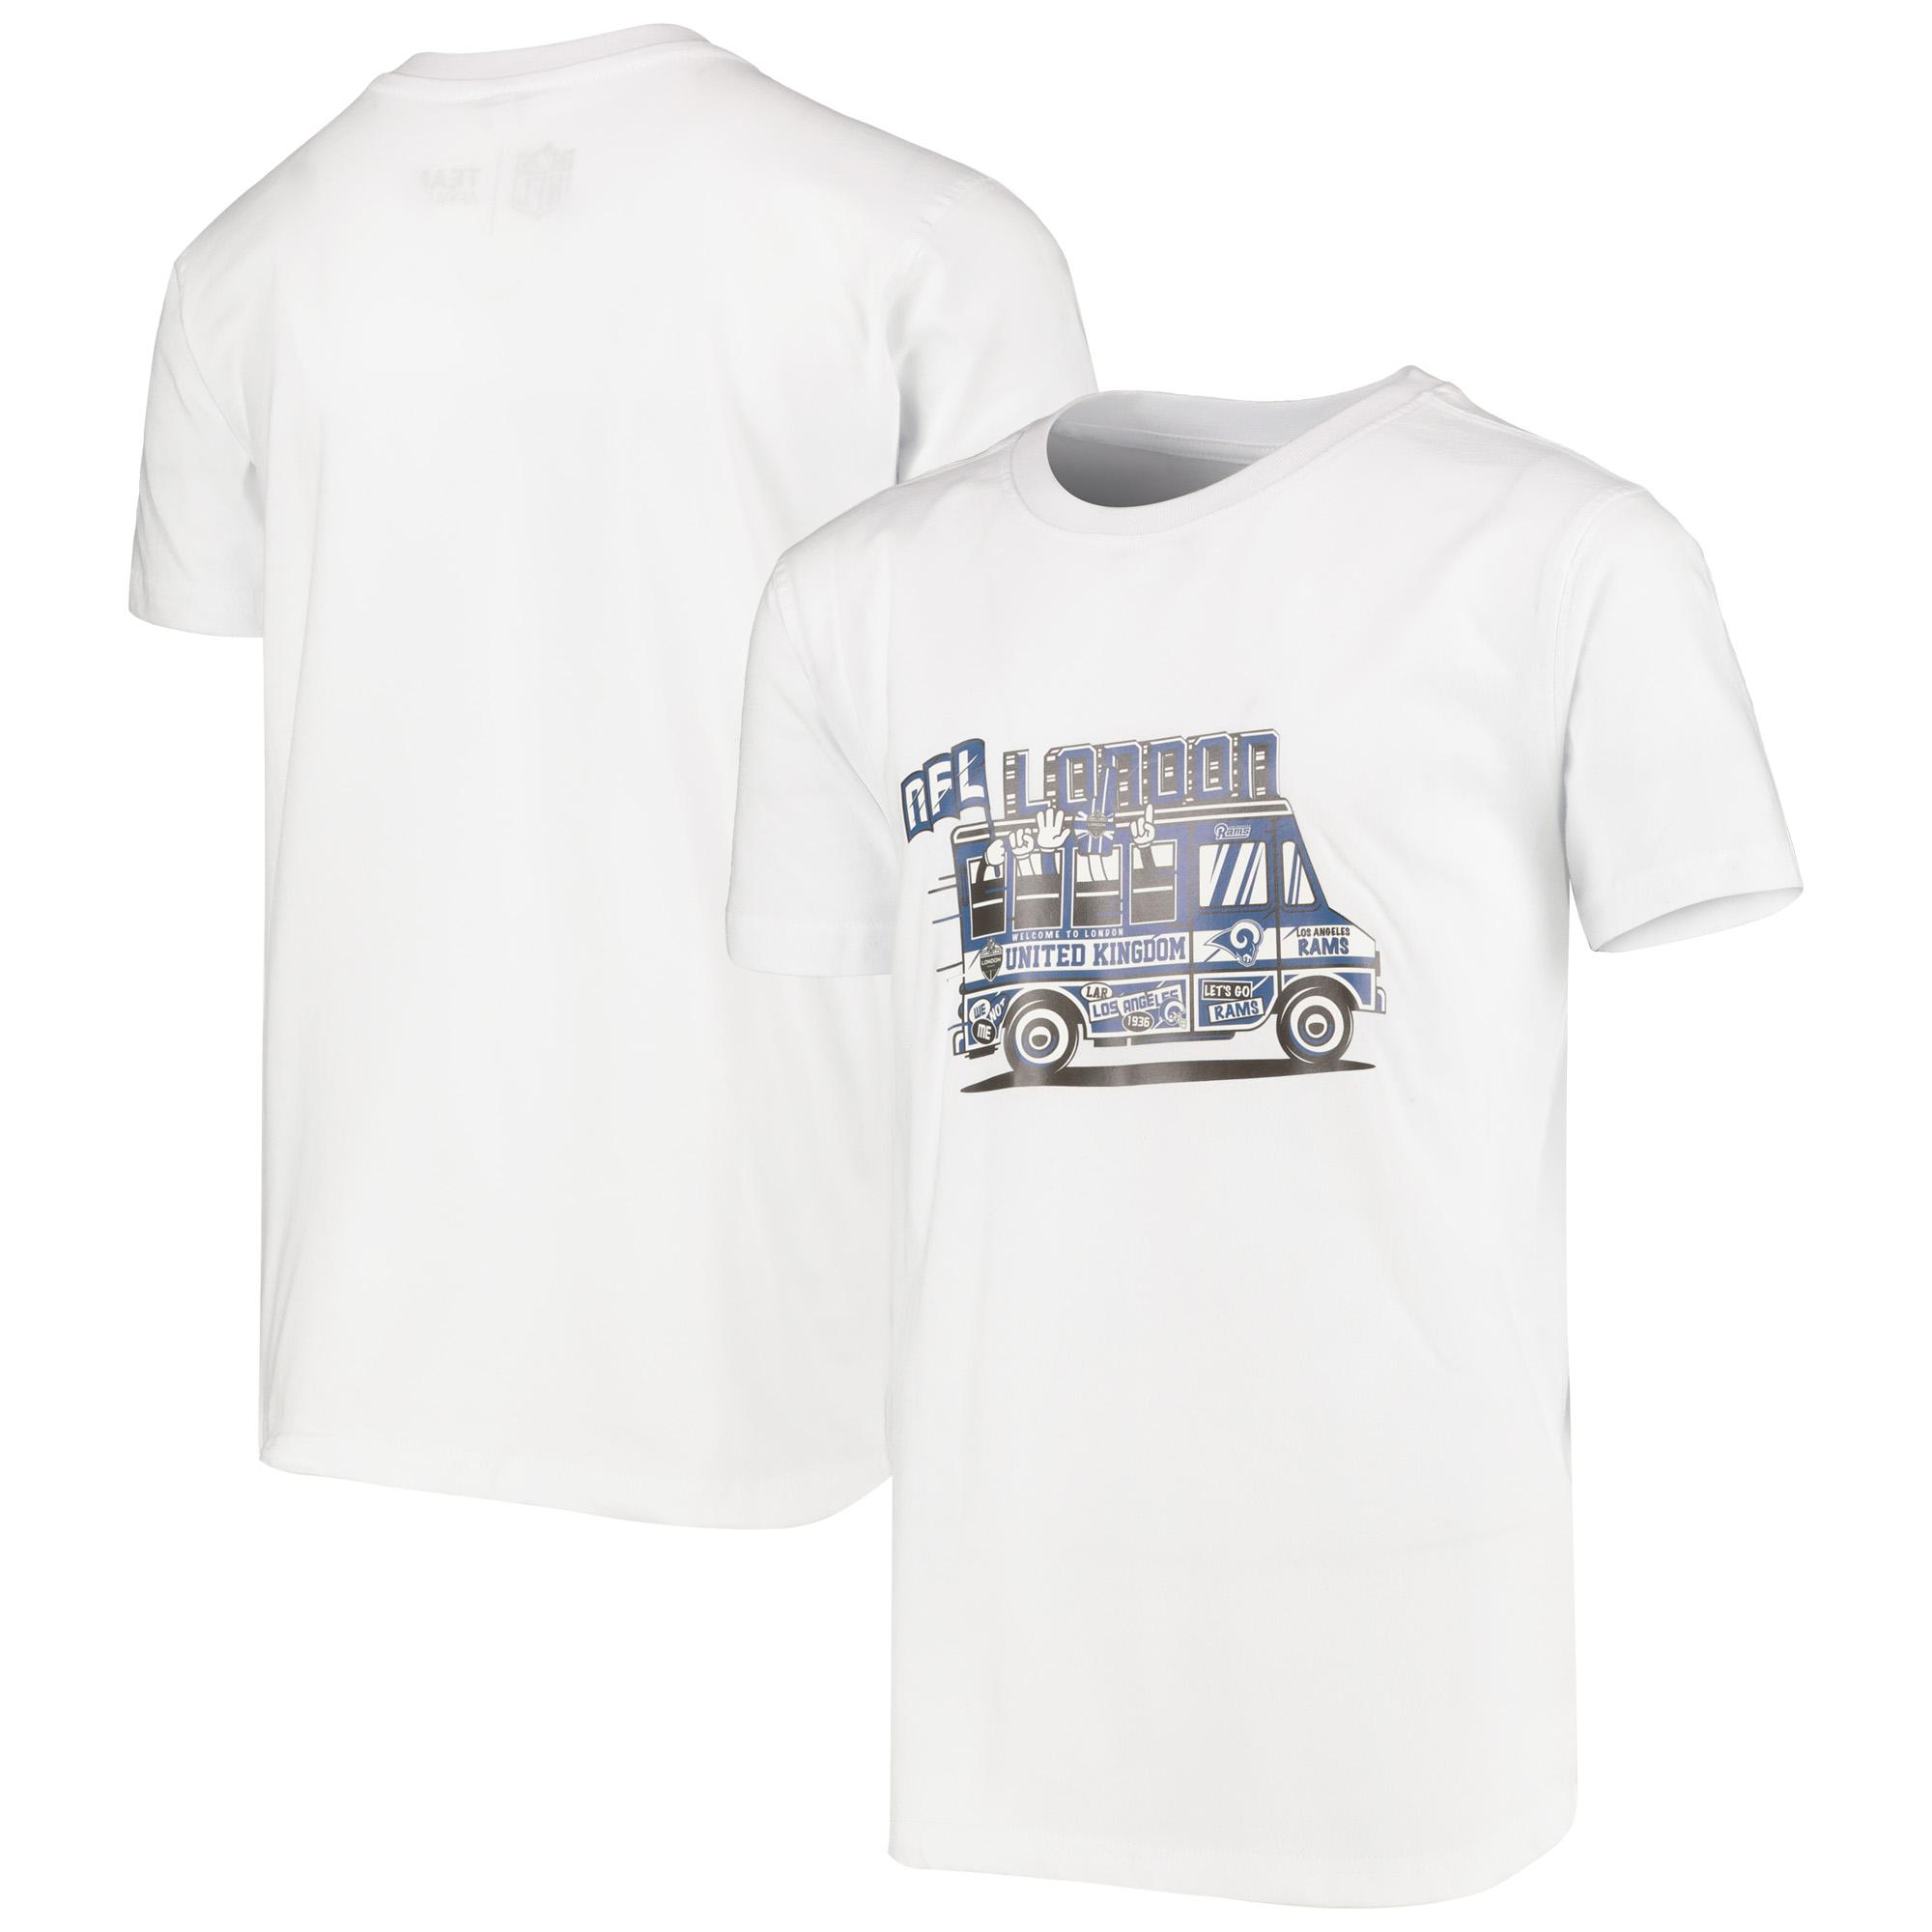 Los Angeles Rams Los Angeles Rams Bus T-Shirt - White - Kids